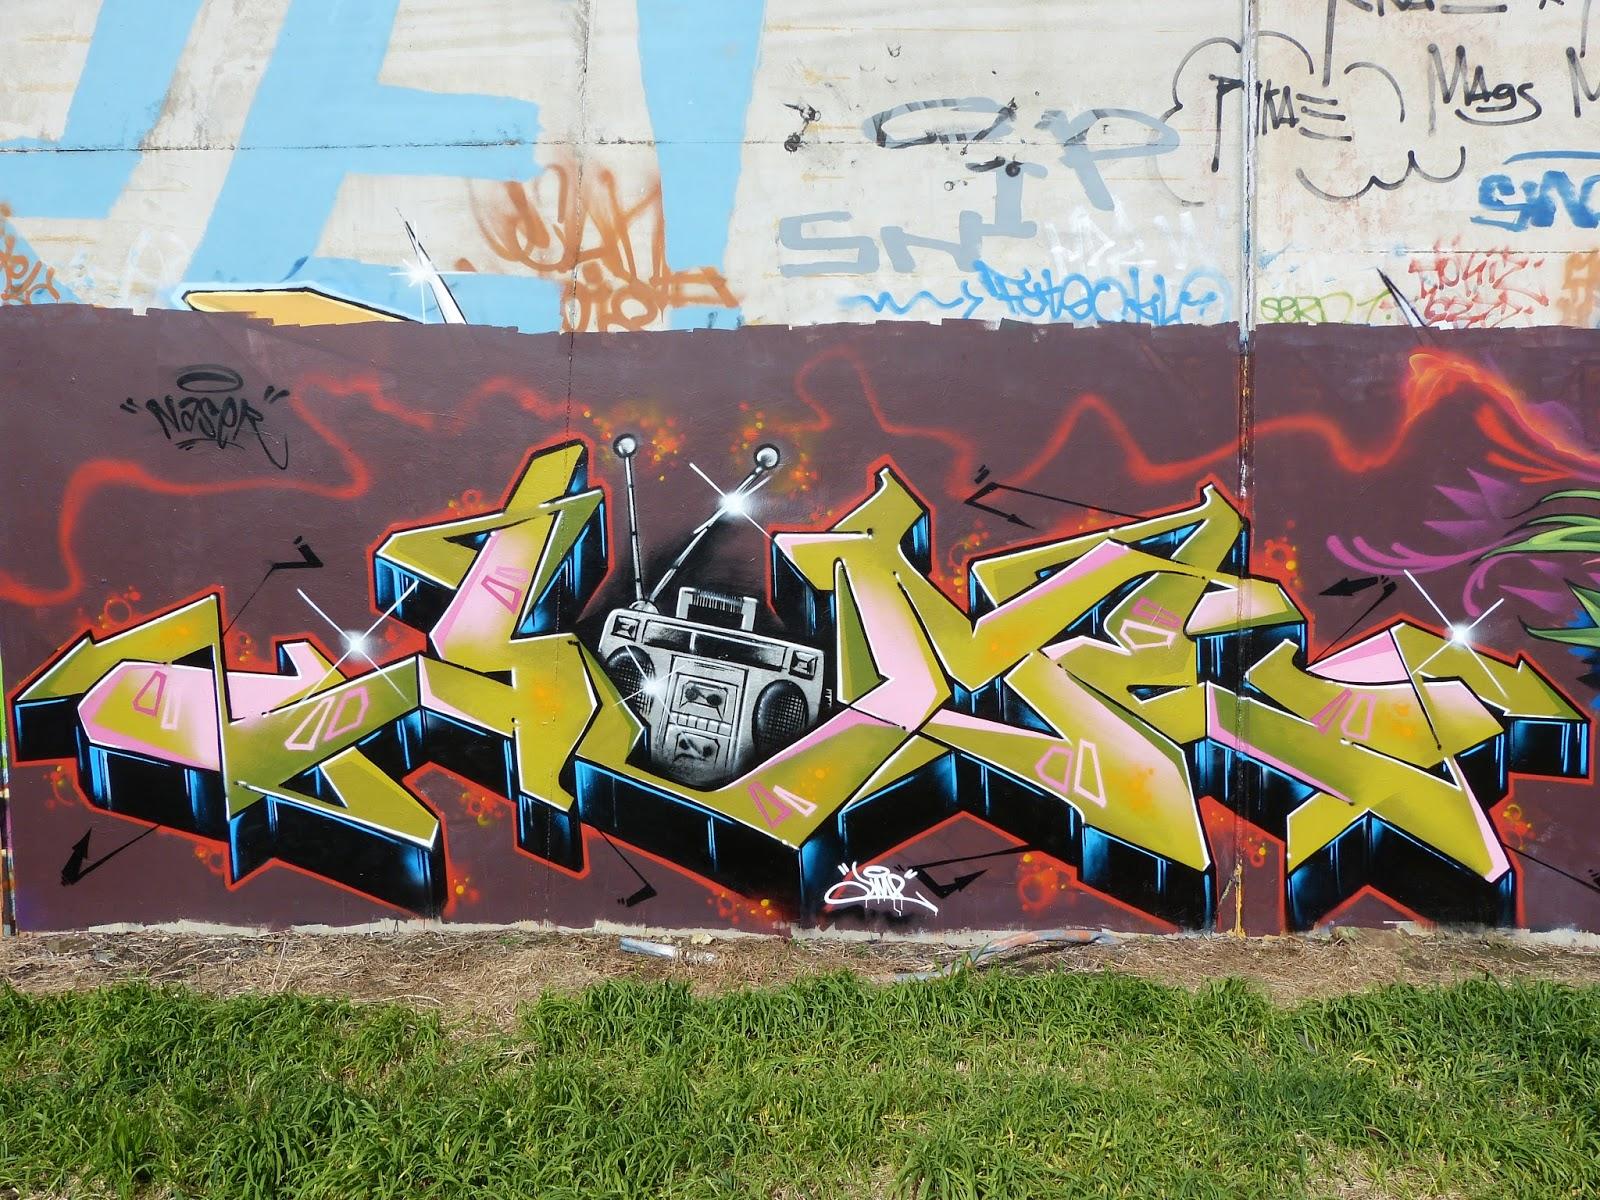 Post Graffiti Australiangraffiti 200Th Postmelbourne's Finest Graffiti